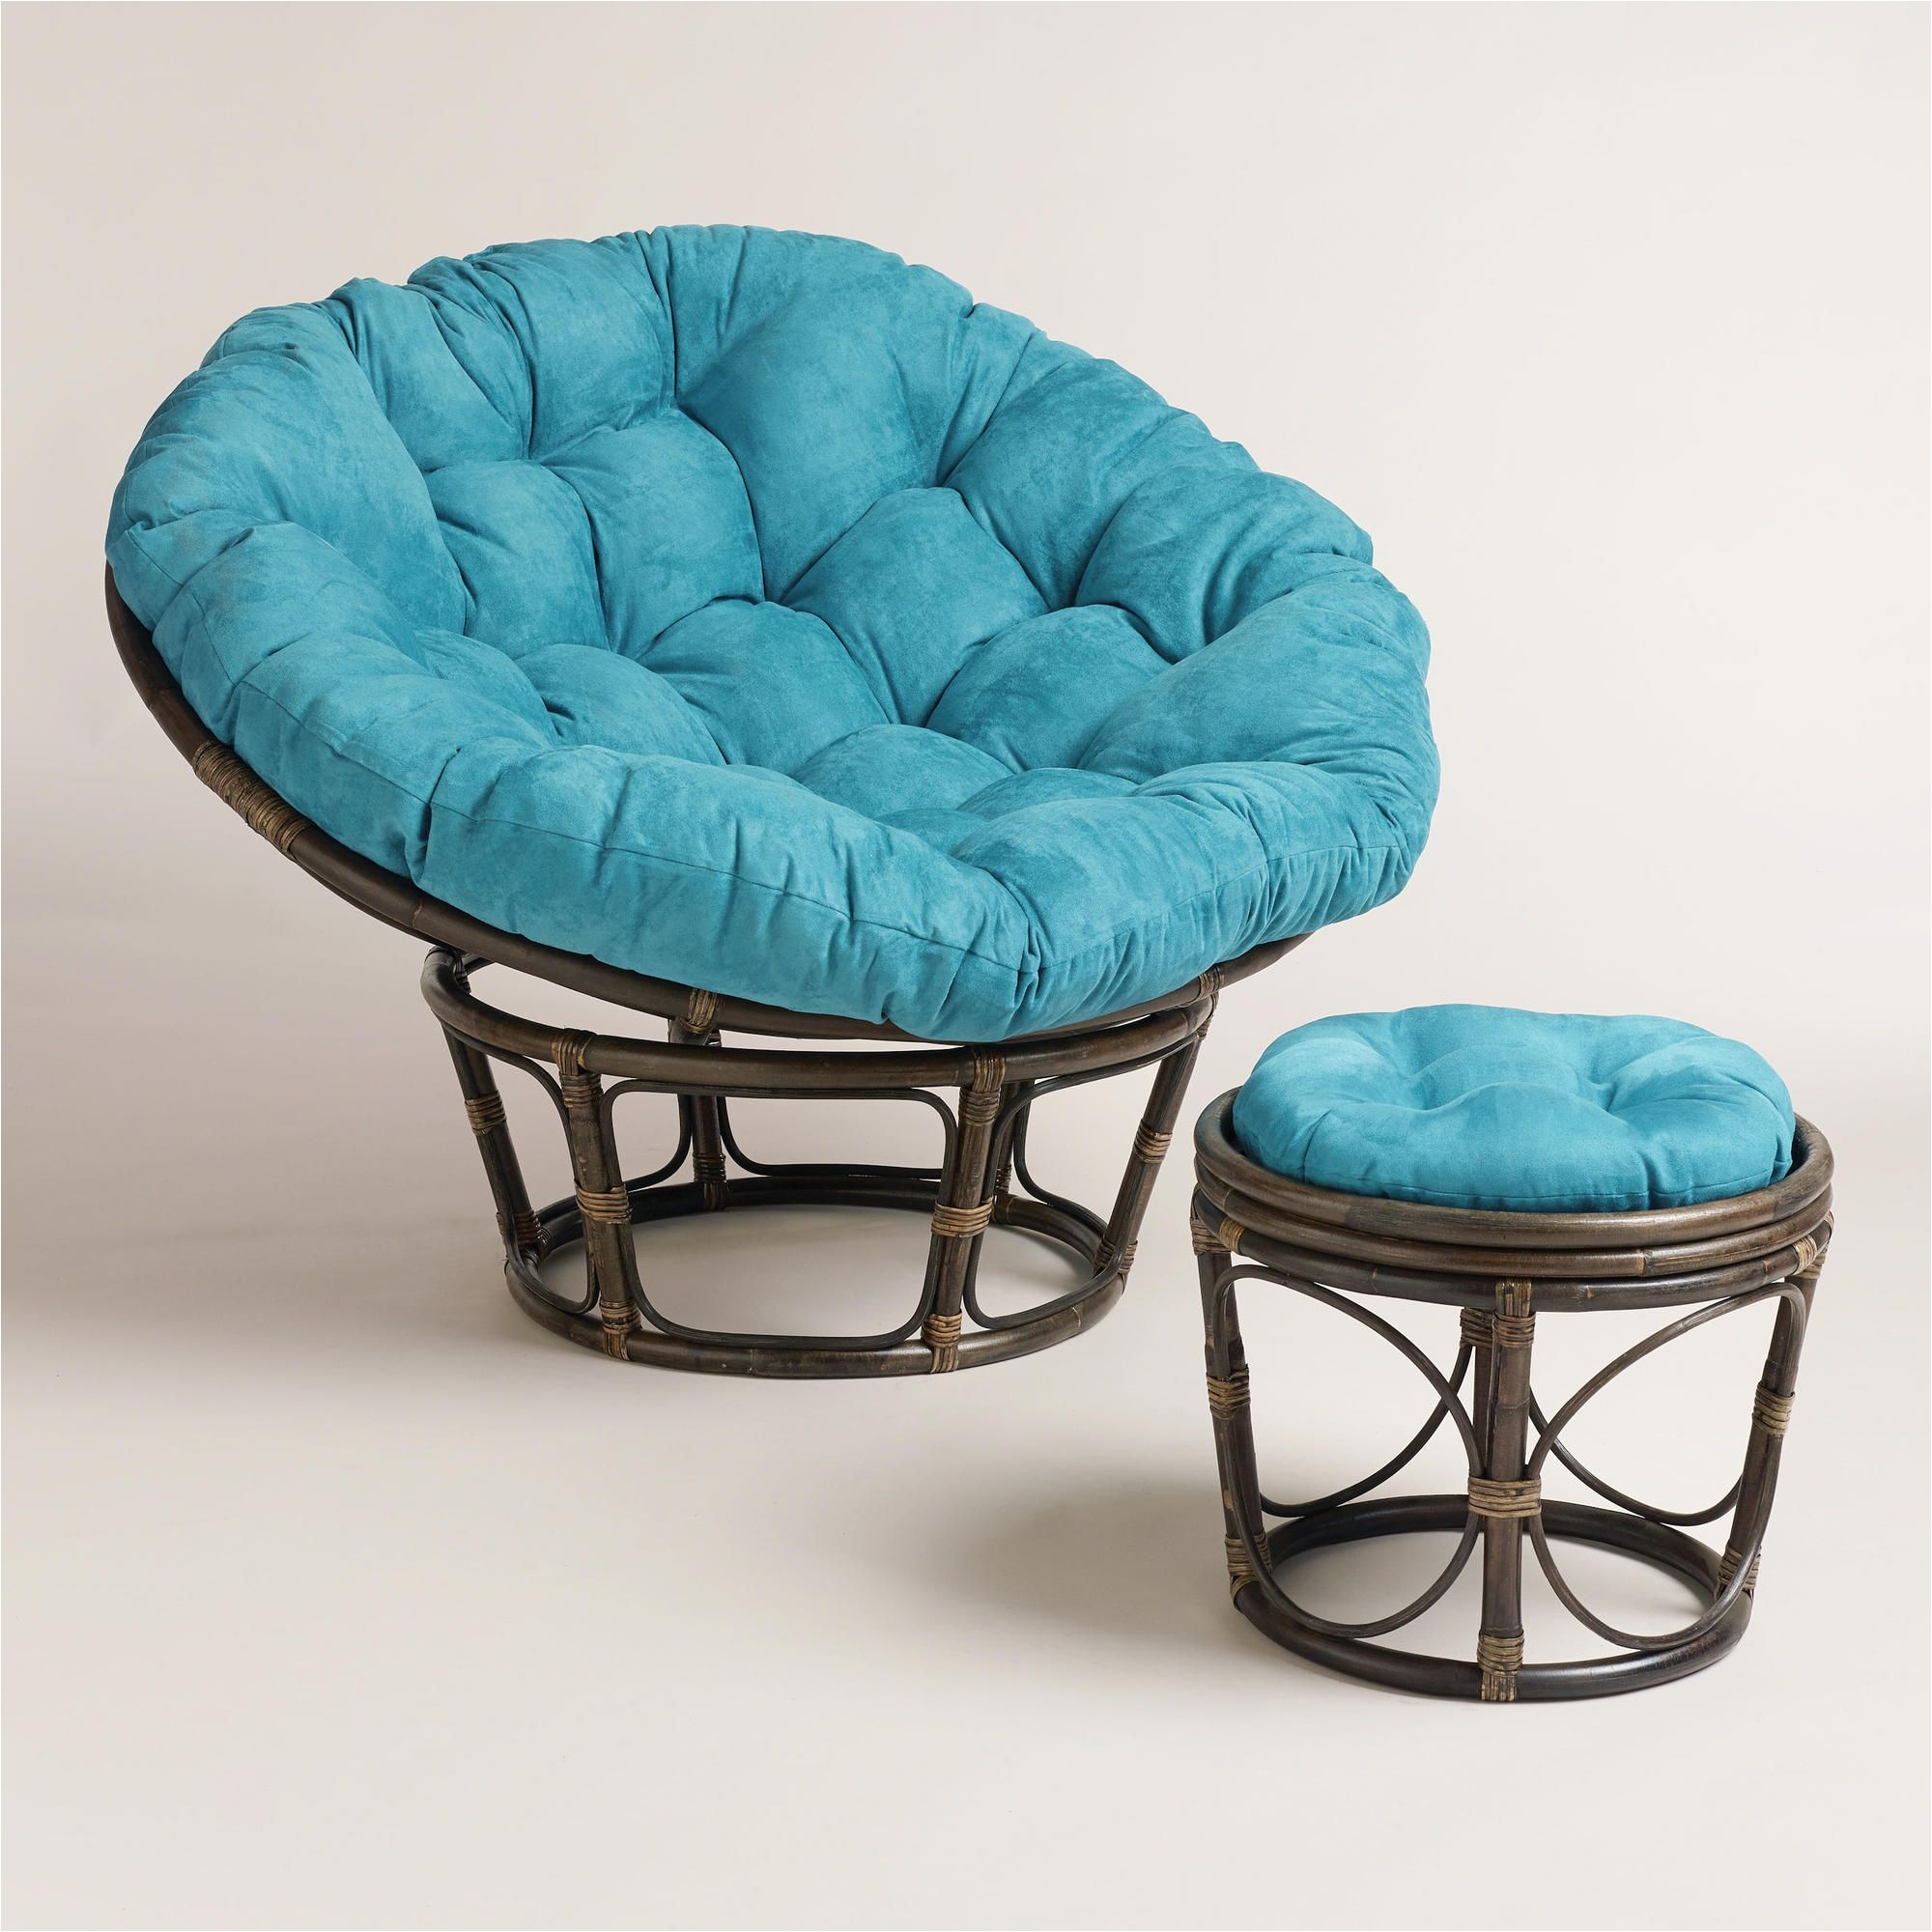 Double Papasan Chair World Market Porcelain Micro Suede Papasan Chair Cushion Papasan Chair